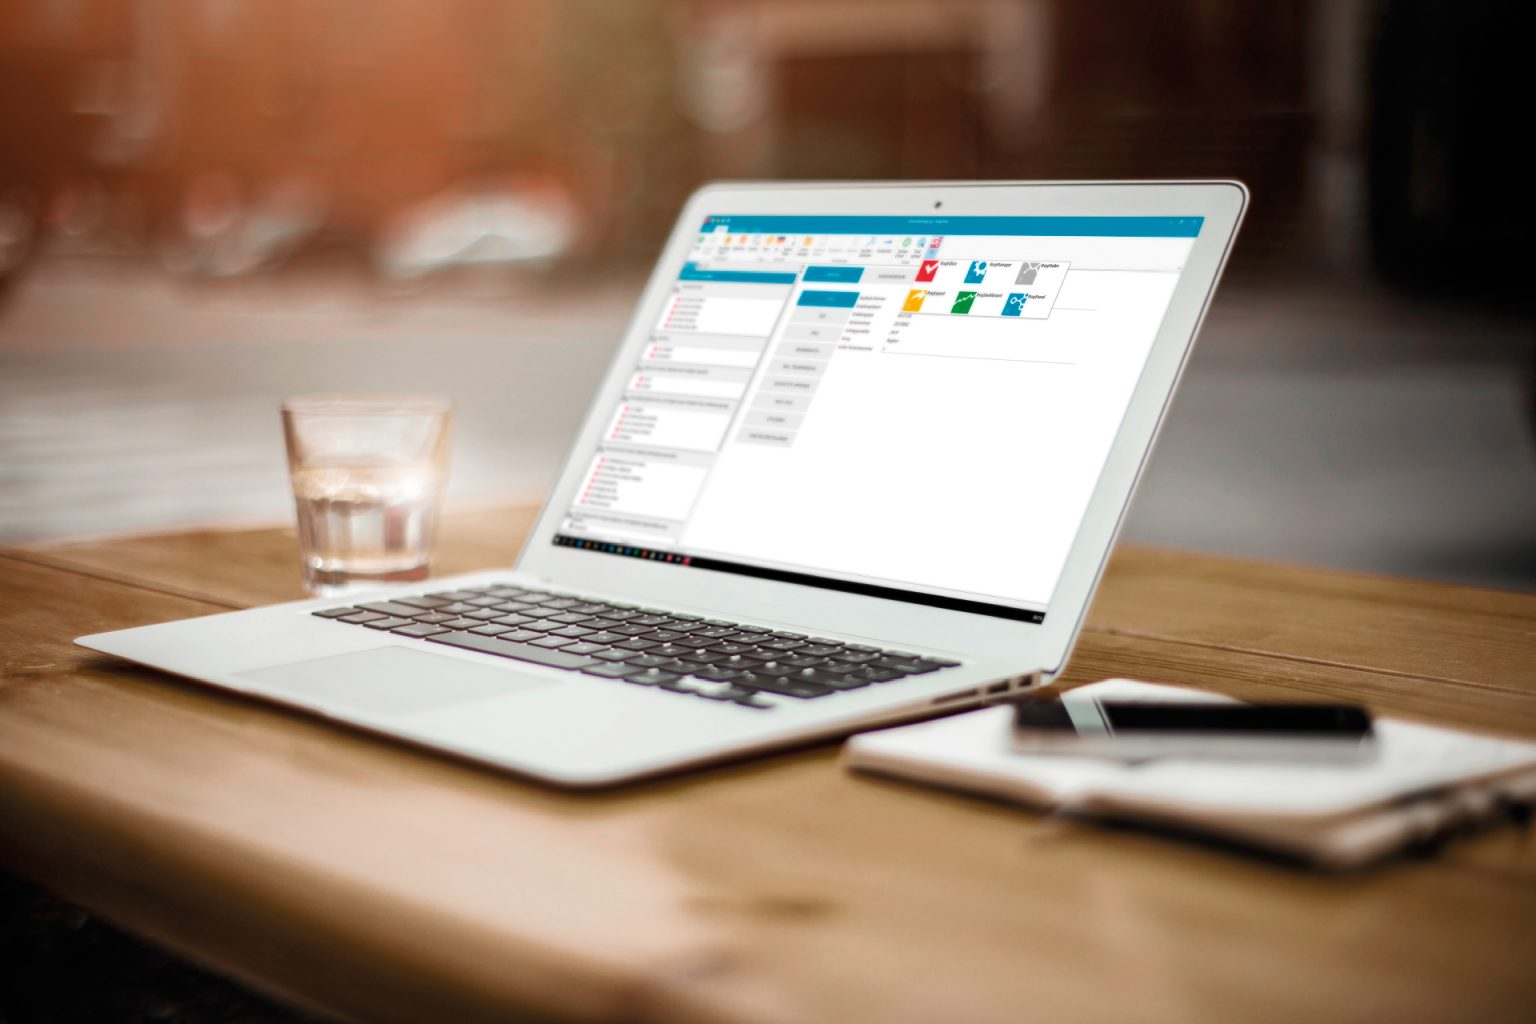 offener Laptop mit G3plus